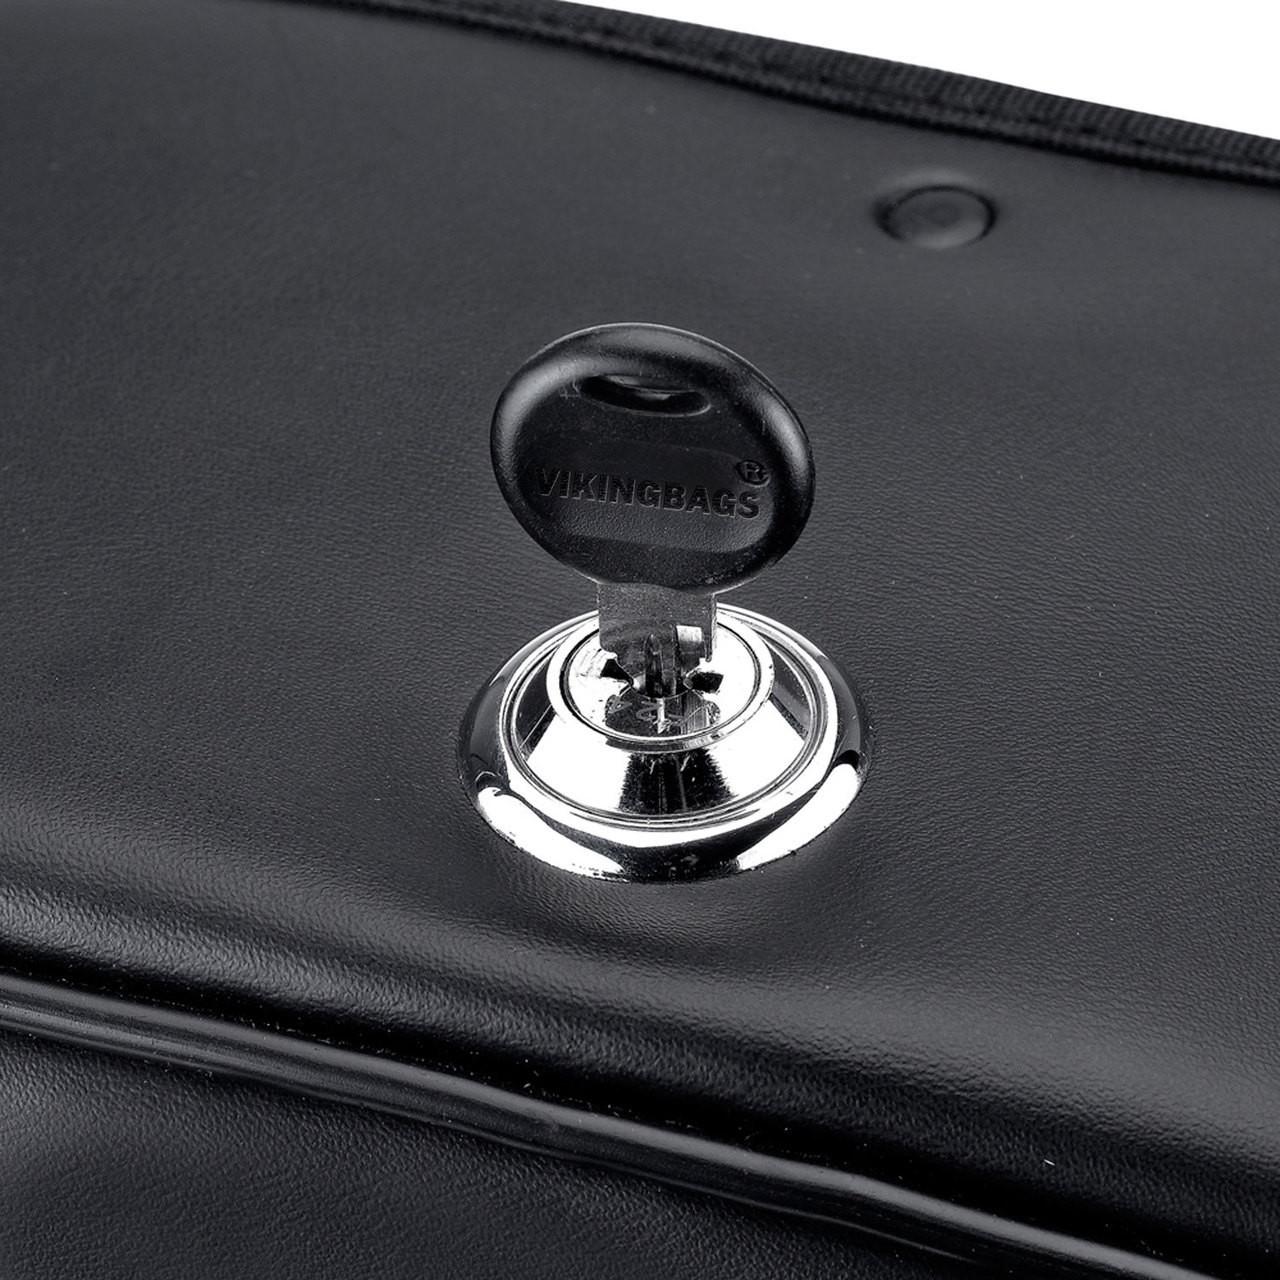 Vikingbags Shock Cutout Large Slanted Saddlebags Key Lockable